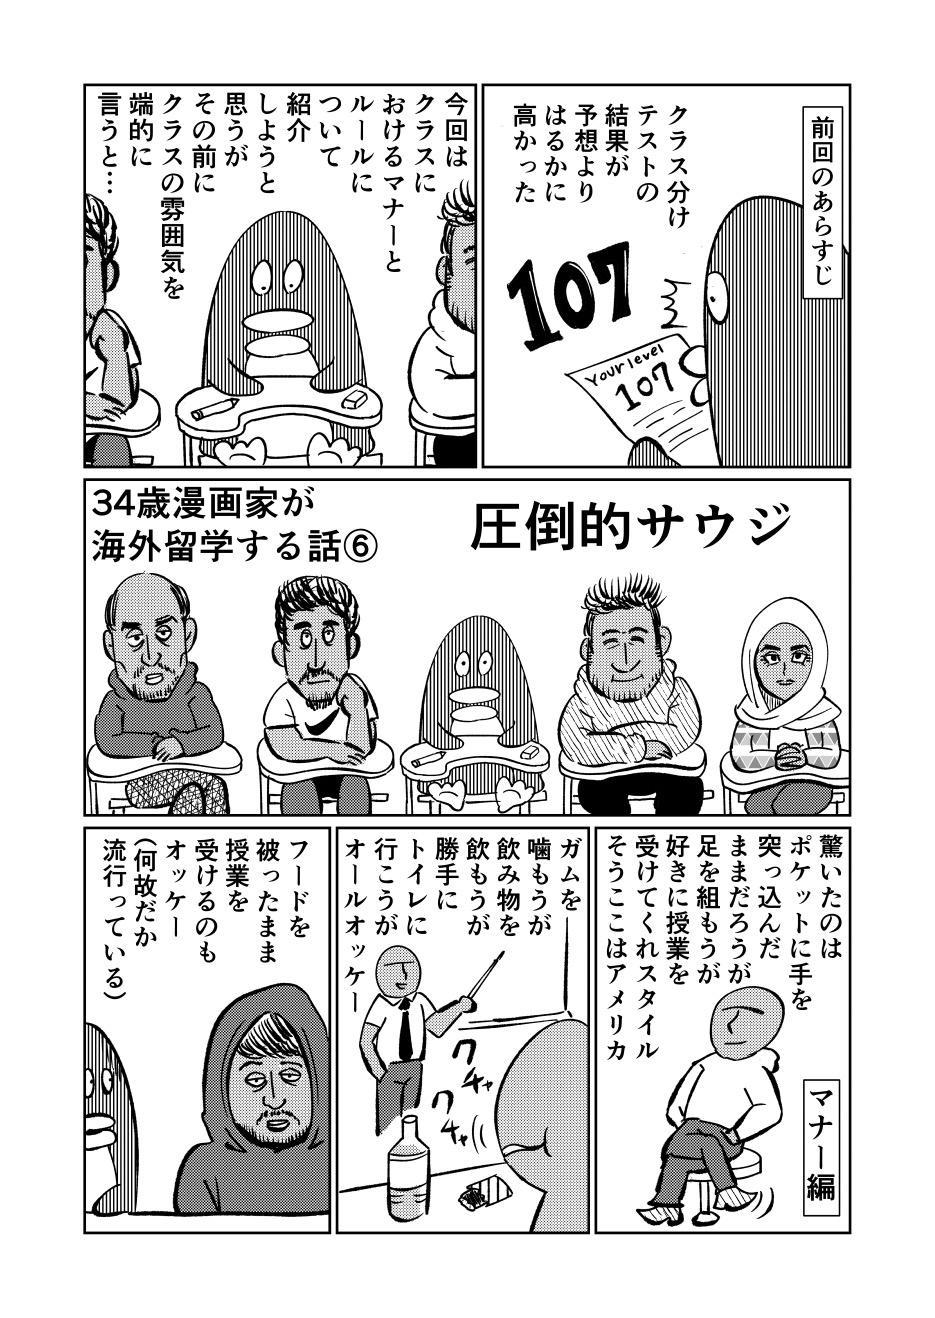 https://www.ryugaku.co.jp/blog/els_portland/upload/78C95001-9C15-4F15-B357-1852B28EB66E.jpeg